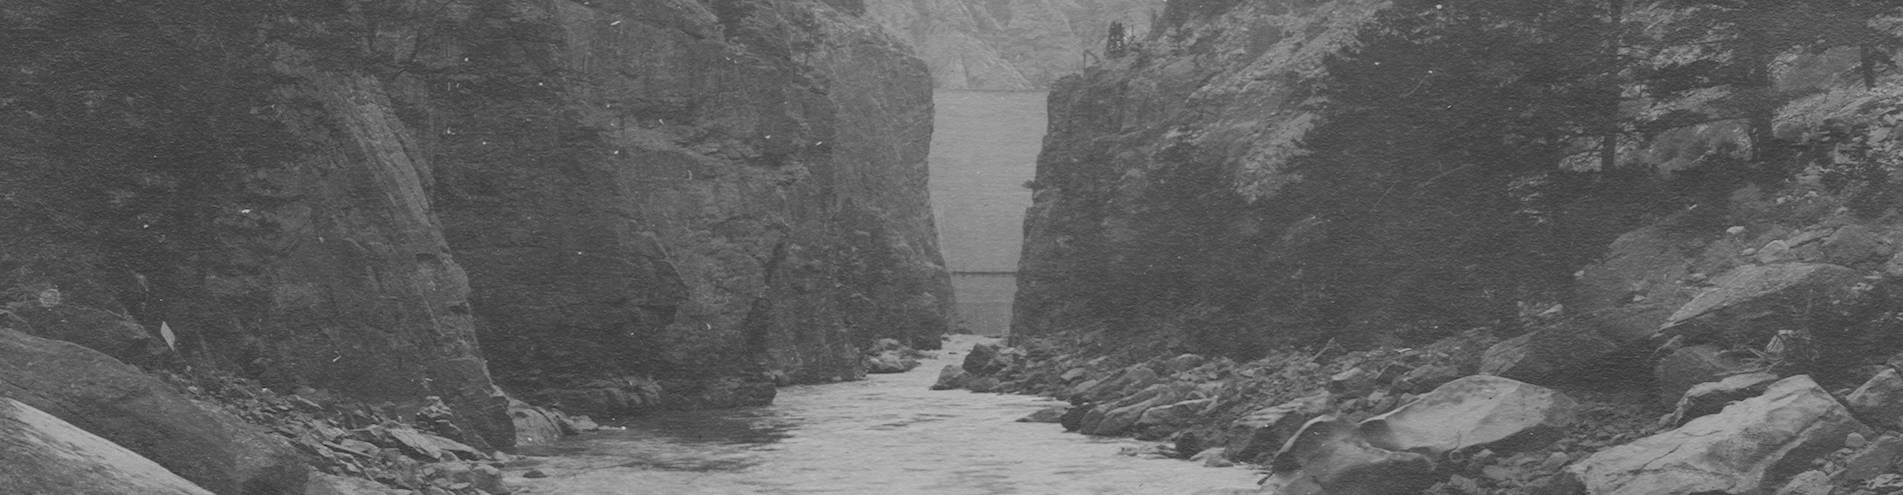 virmuze exhibit Buffalo Bill Dam Construction and History logo main banner